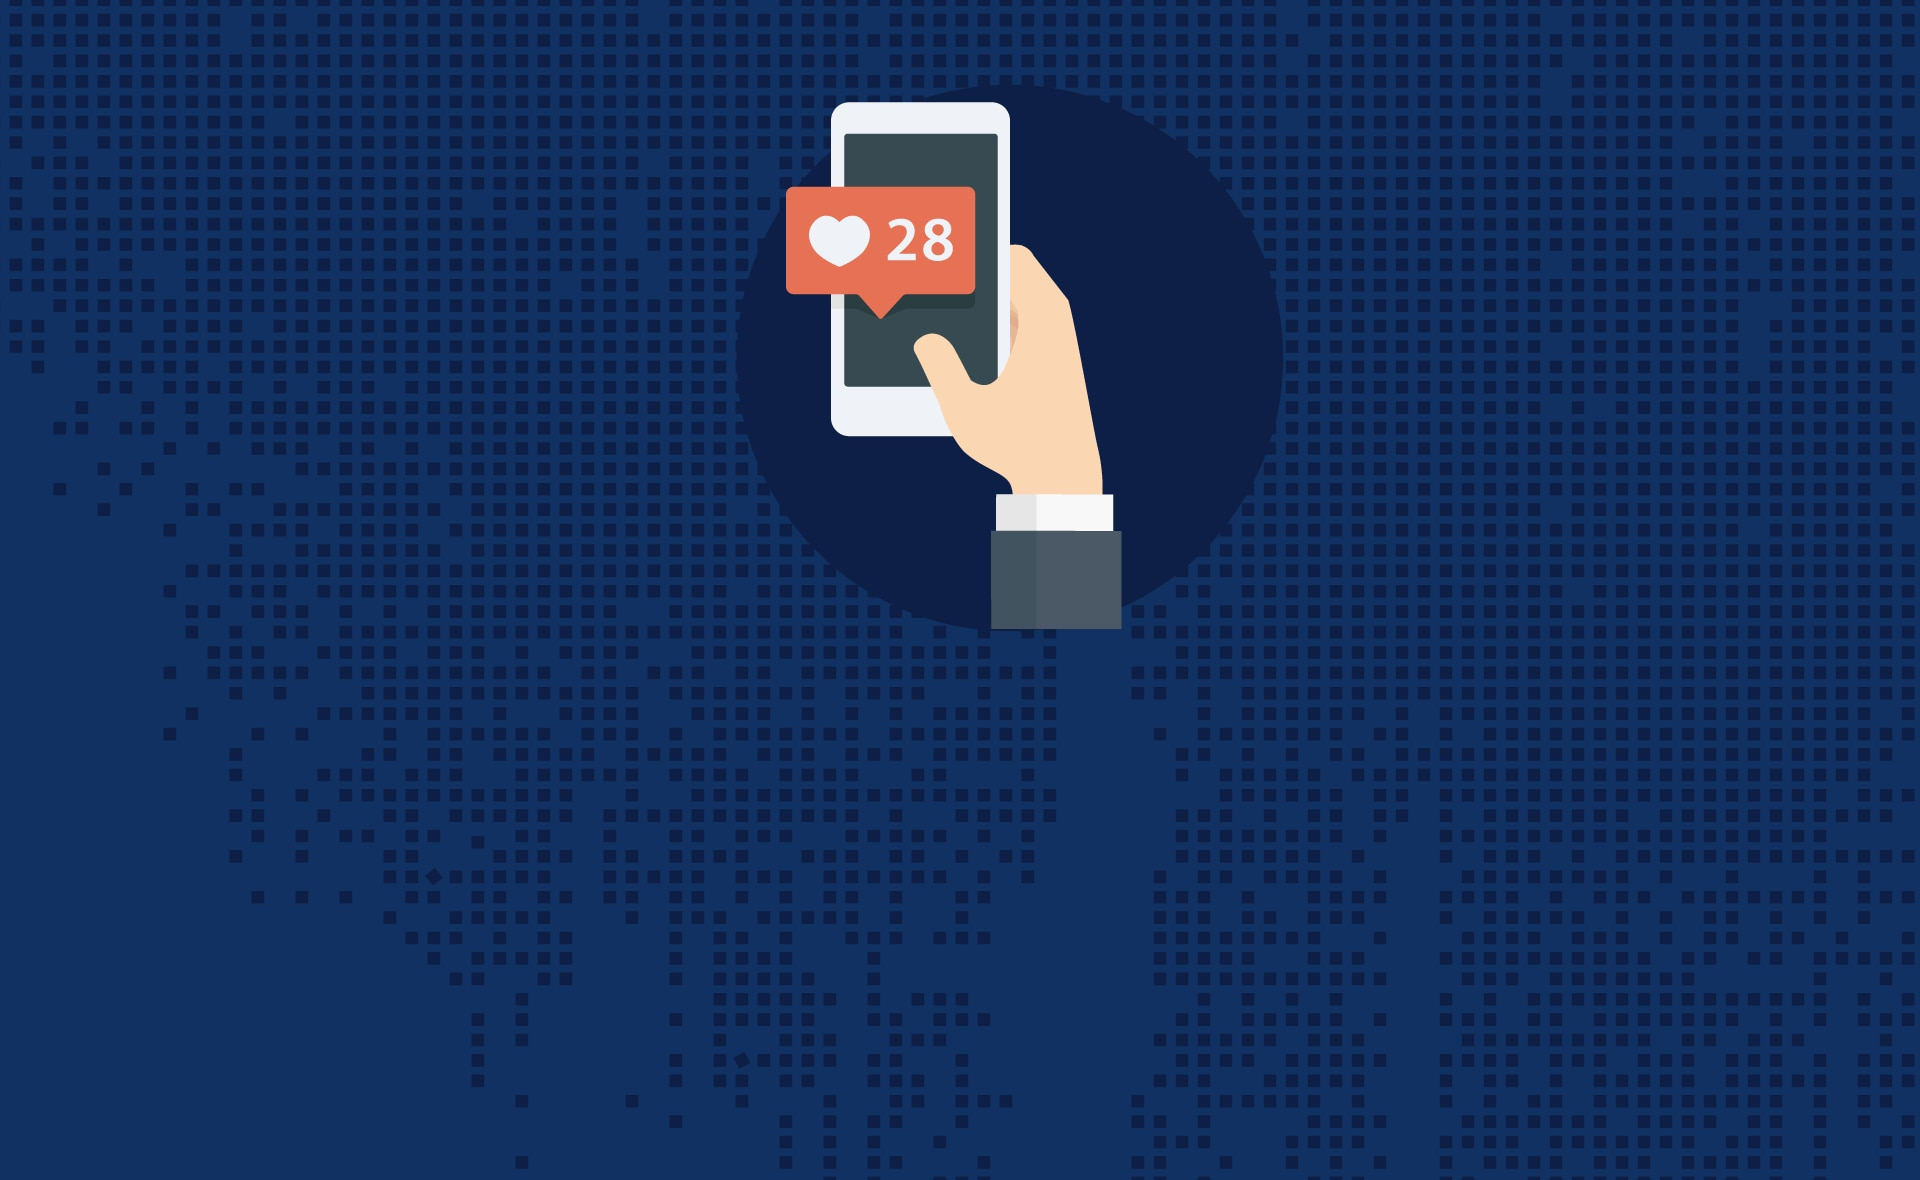 Fintech-redes-sociales-like-twitter-movil-app-bbva